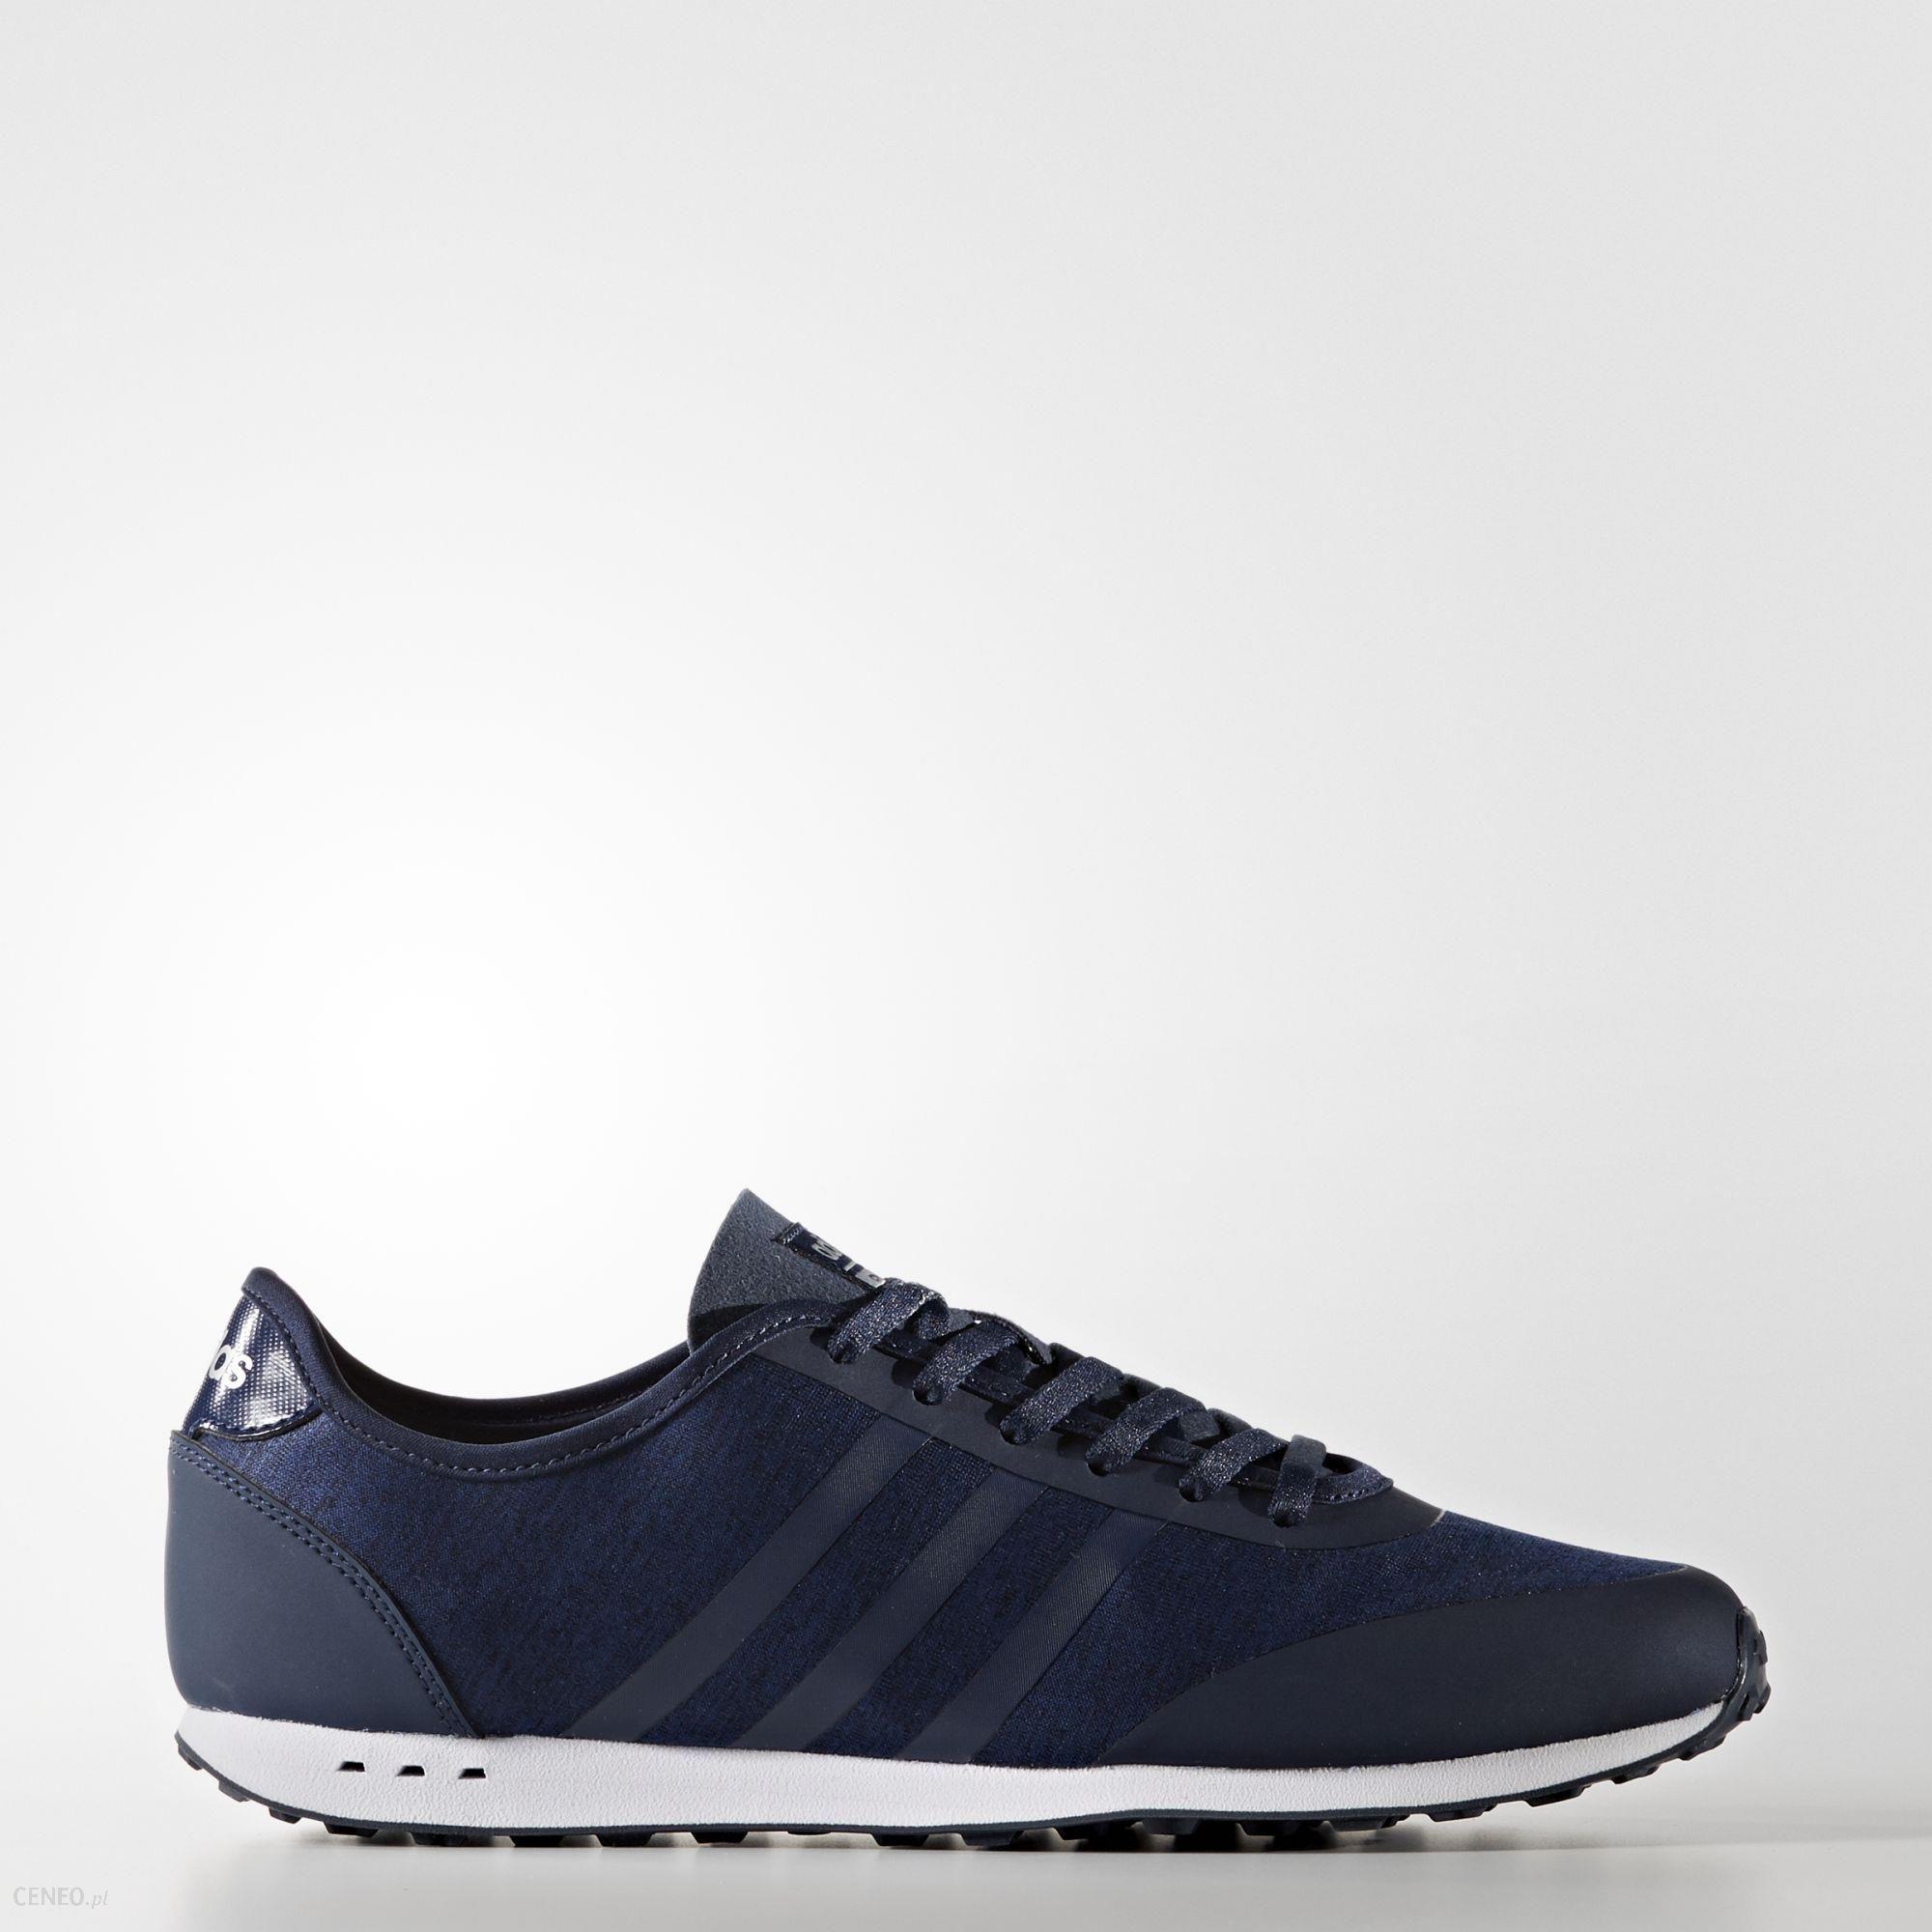 adidas damskie buty neo style racer